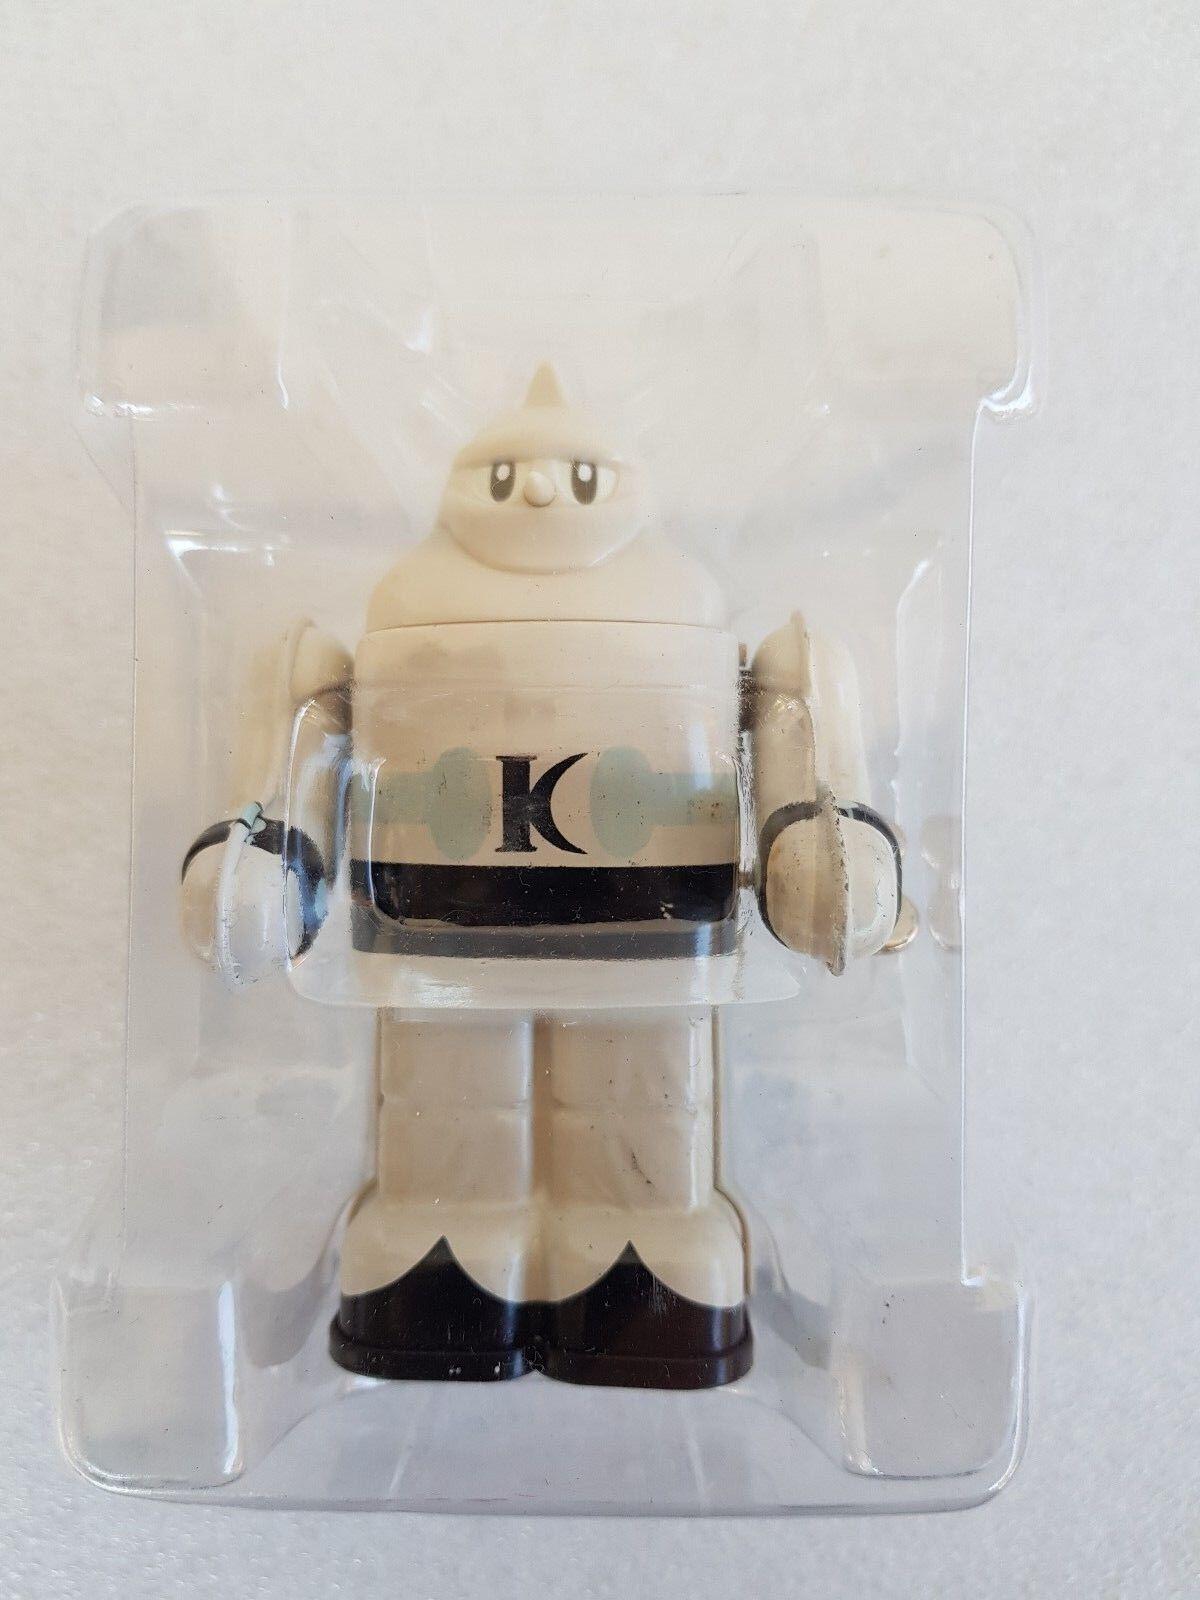 BANPRESTO 1998 White Gigantor (Tetsujin go-28) Wind-up Tin Toy (10 cm)